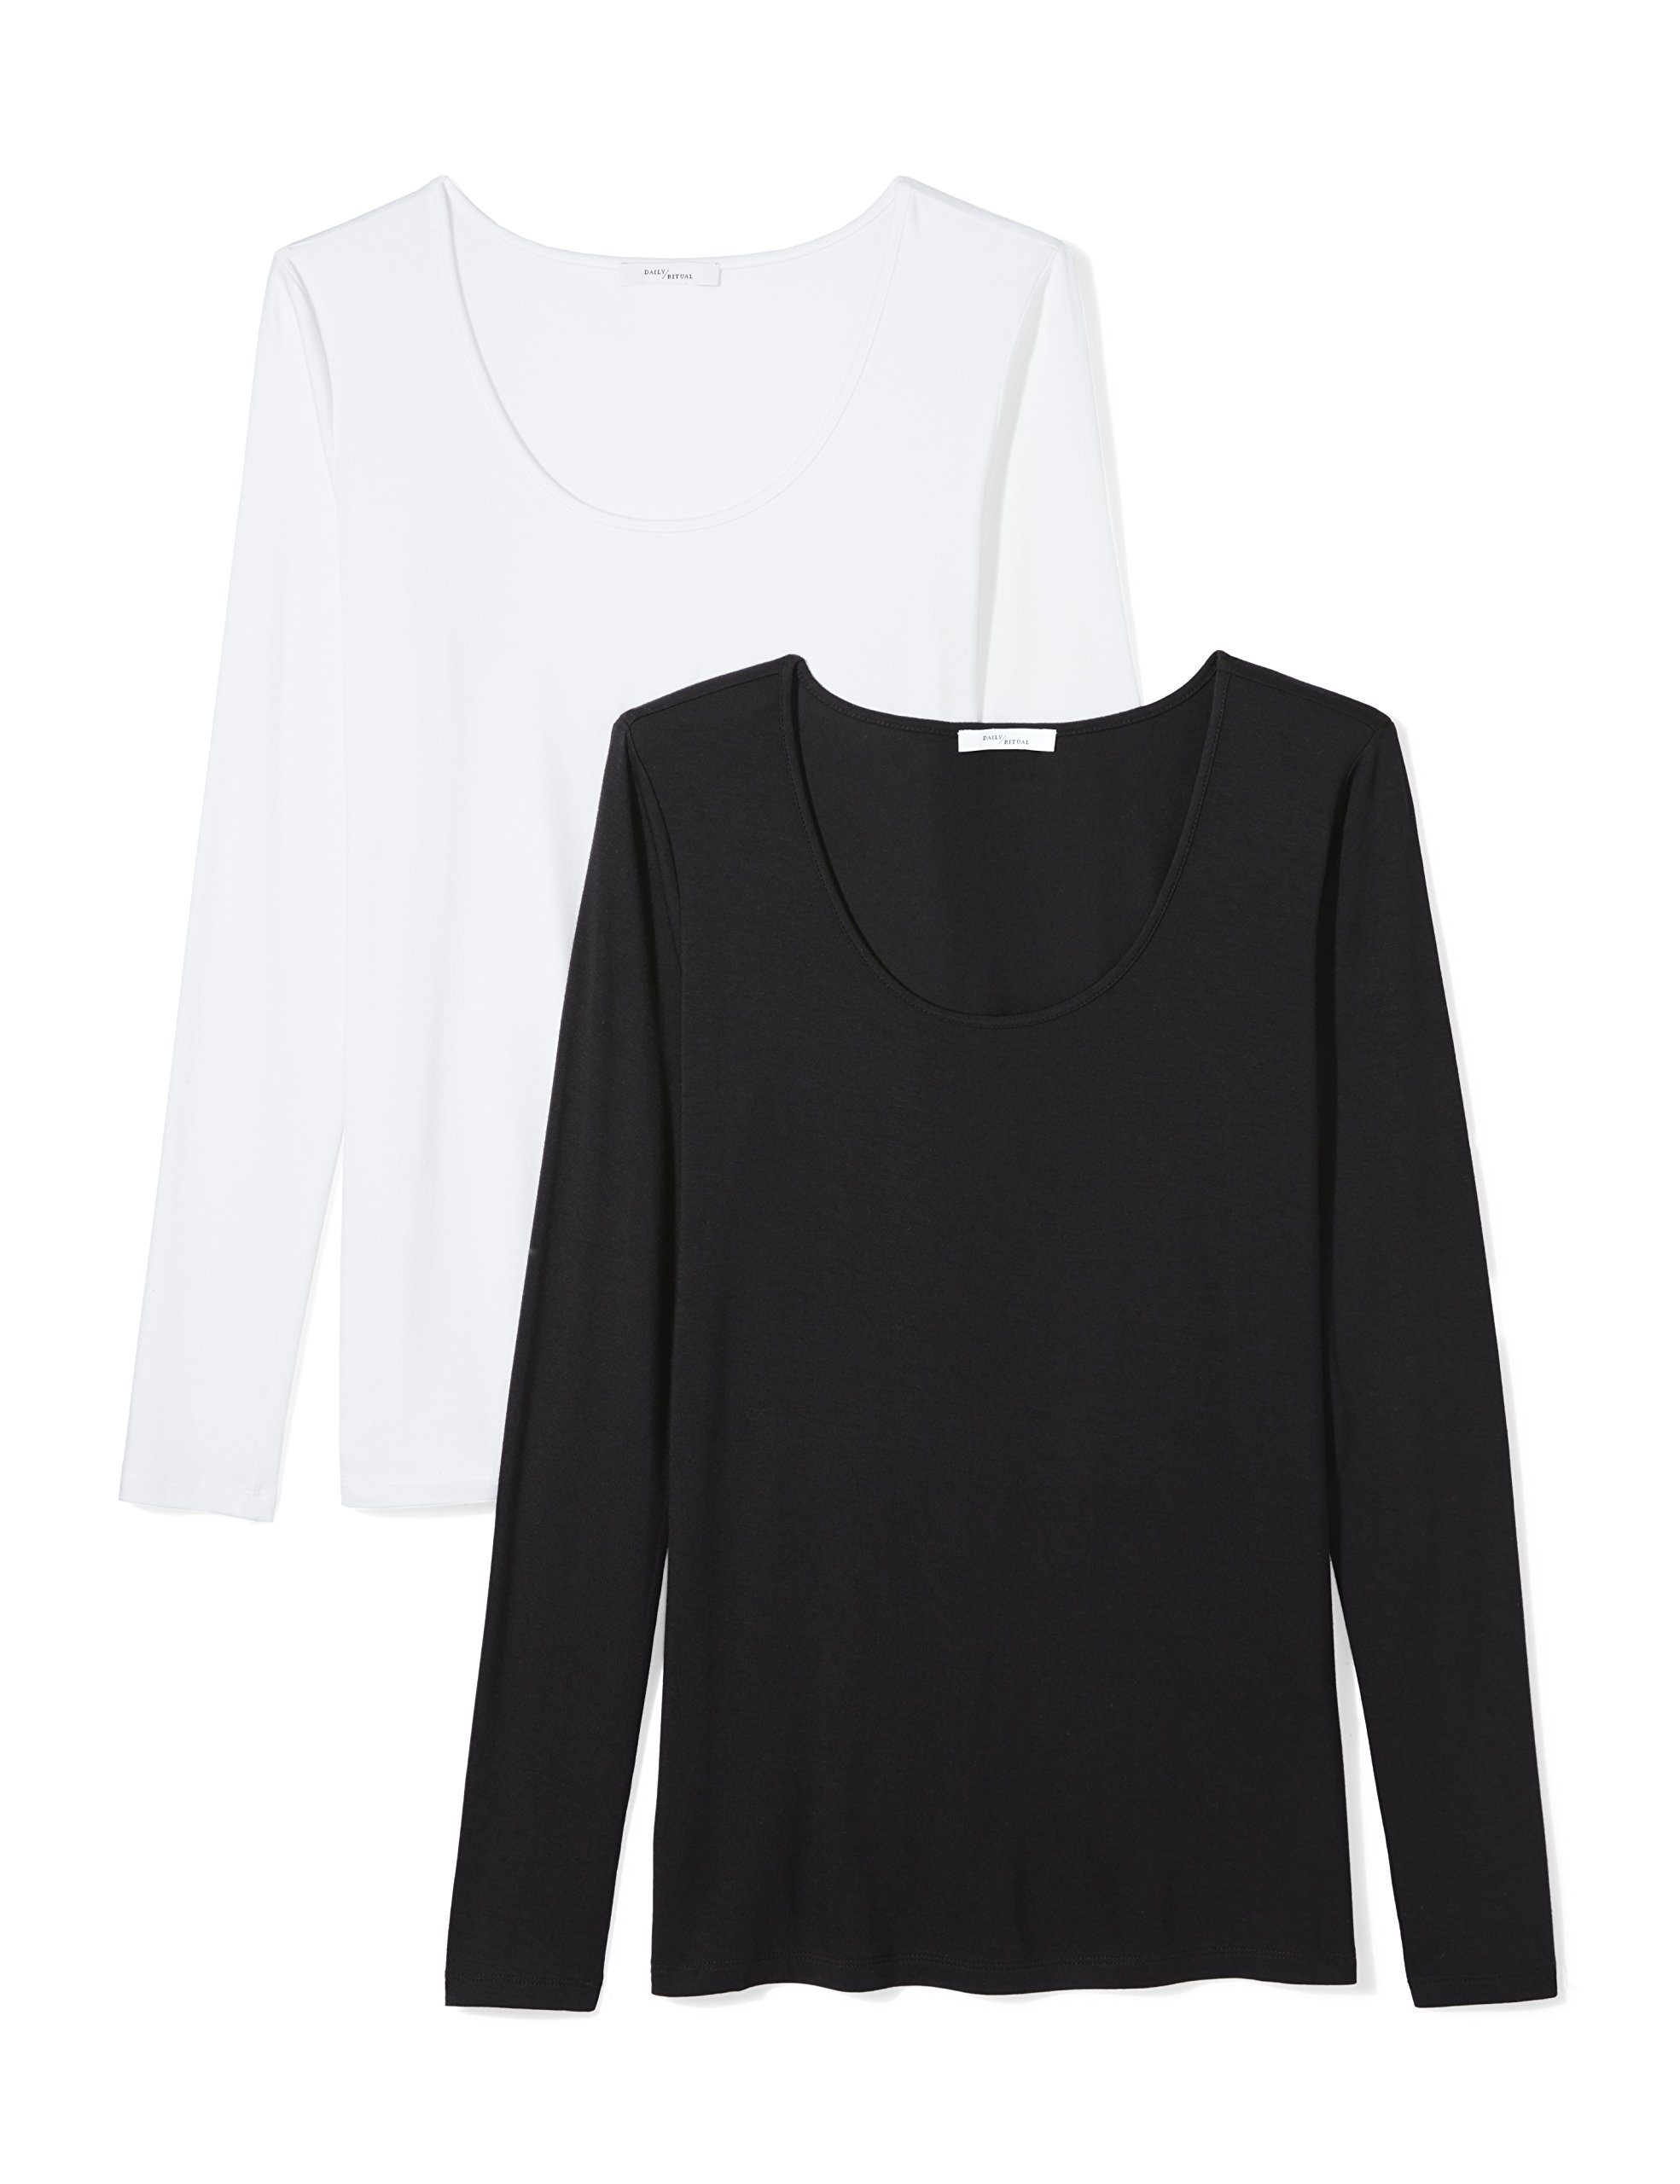 Daily Ritual Women's Jersey Long-Sleeve Scoop Neck T-Shirt, Black/White, Medium